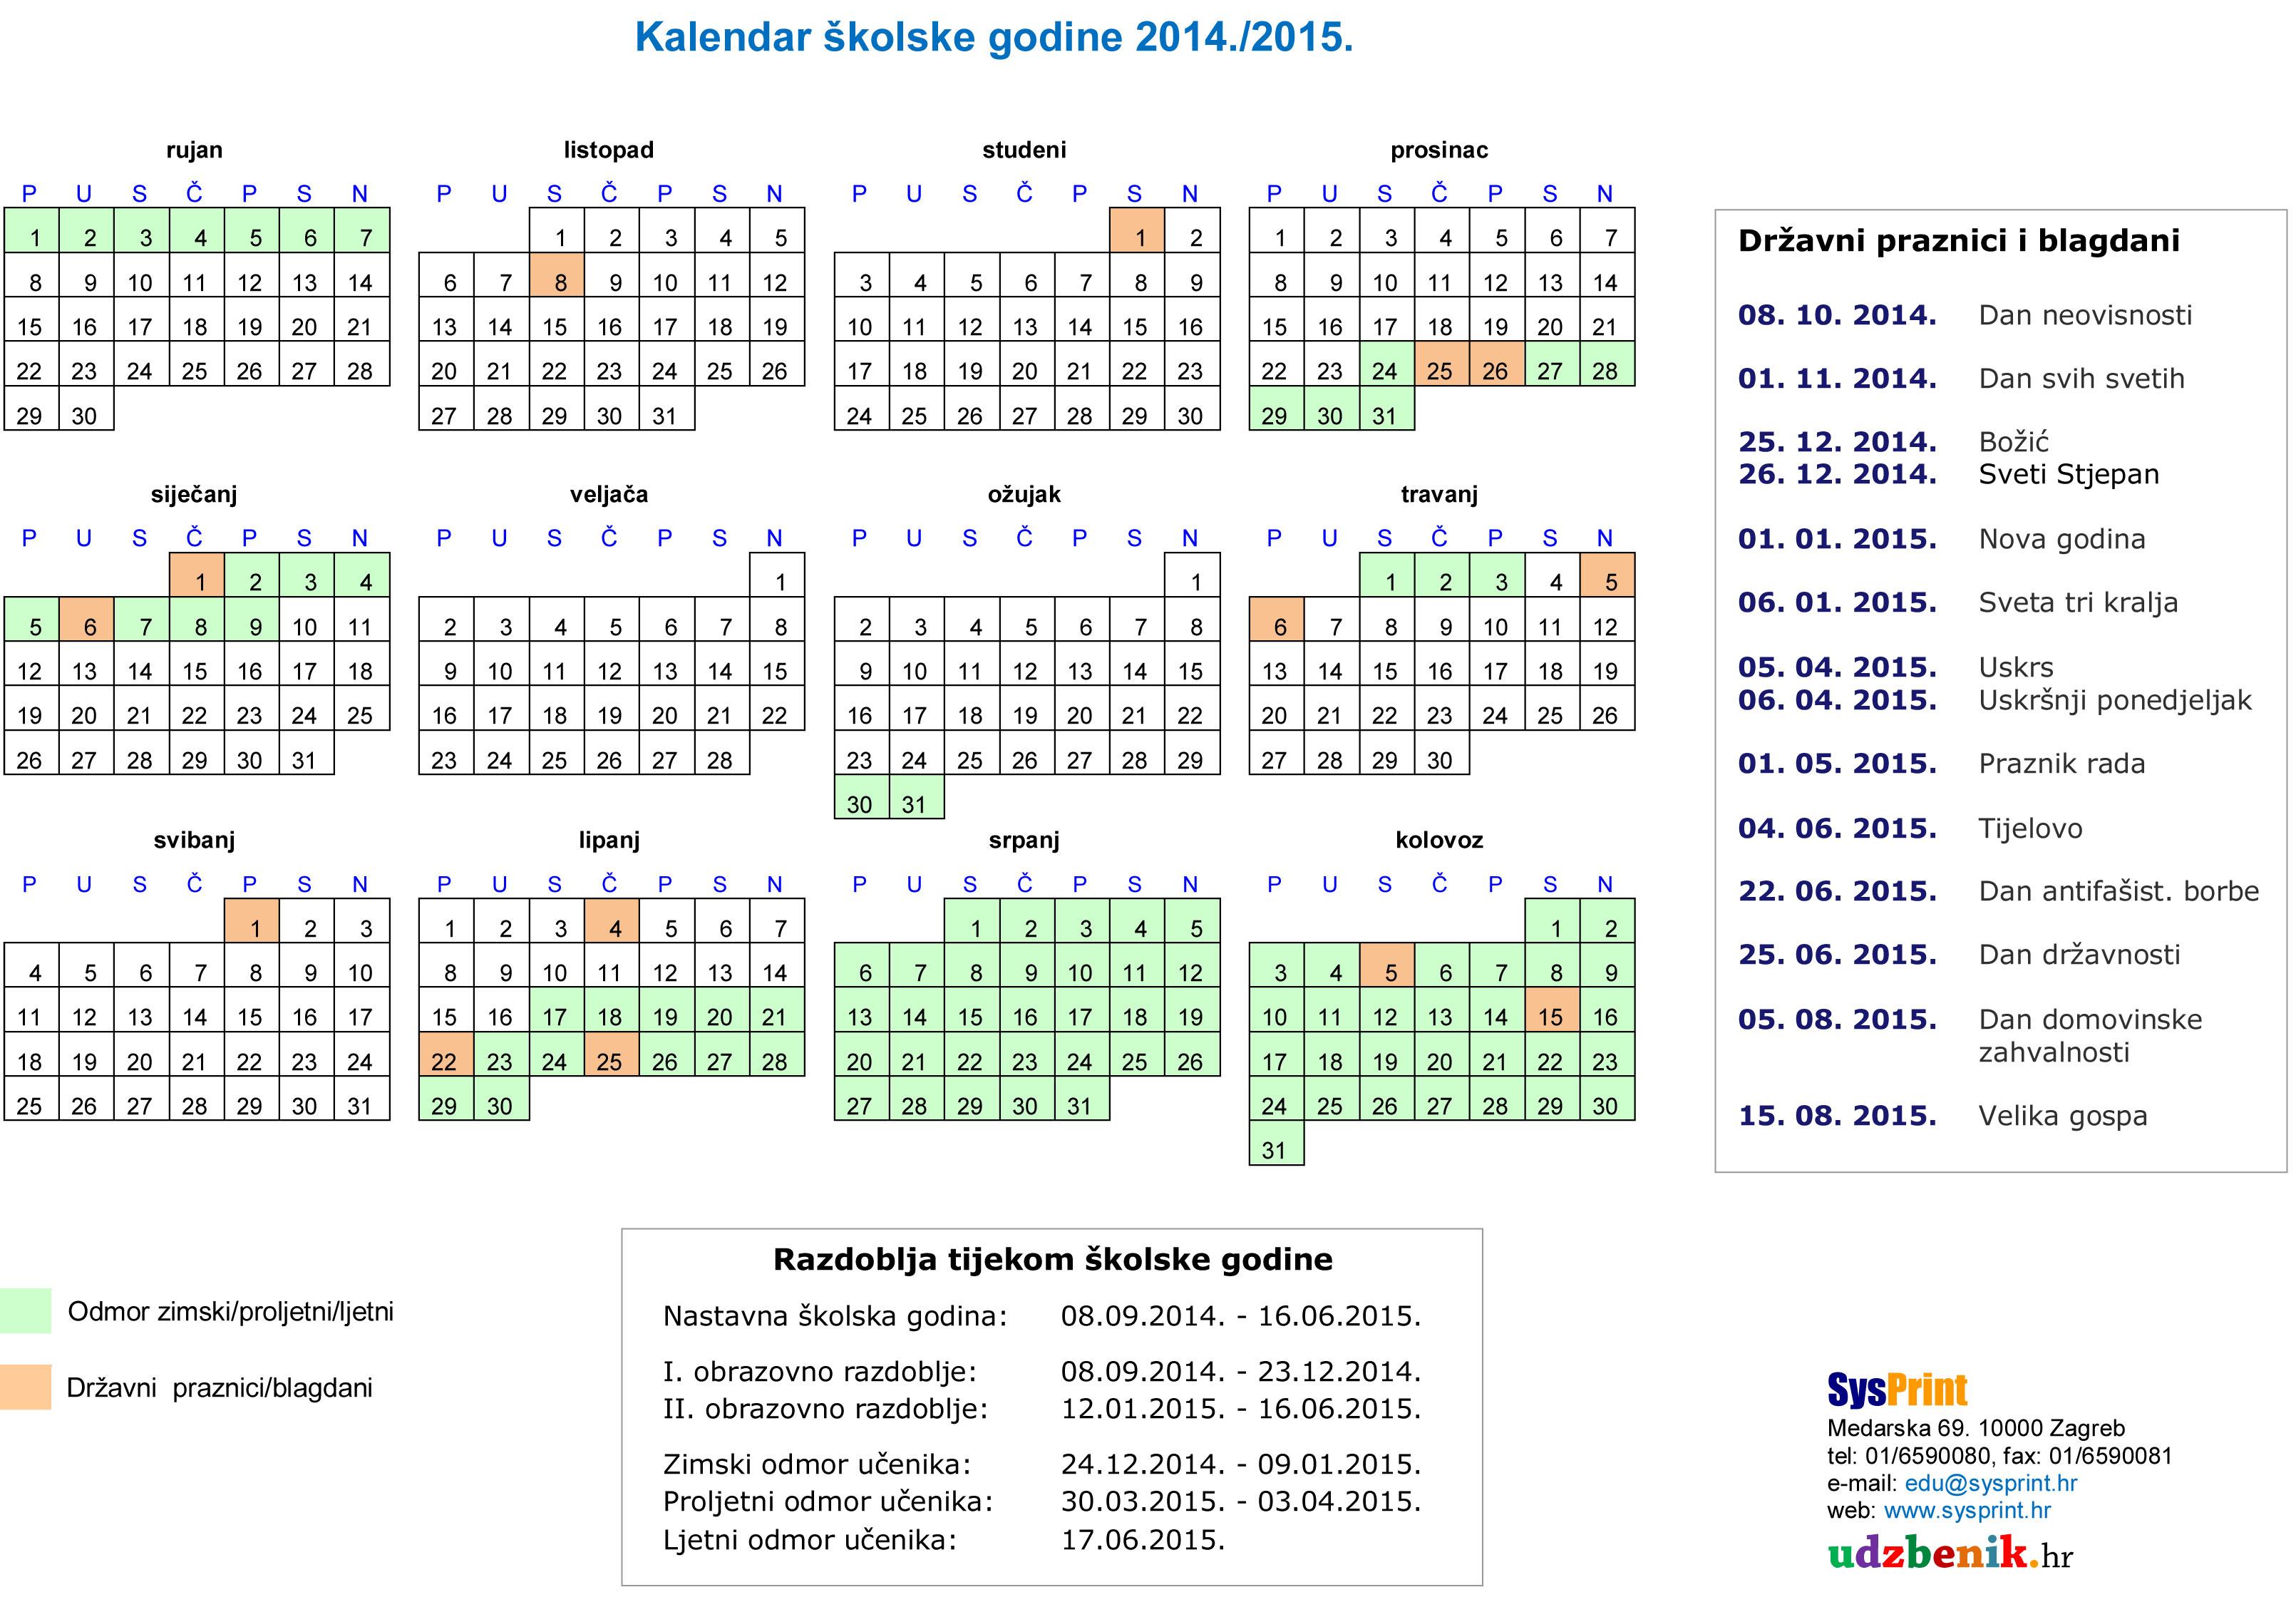 joey fisher 2014 new calendar template MEMES